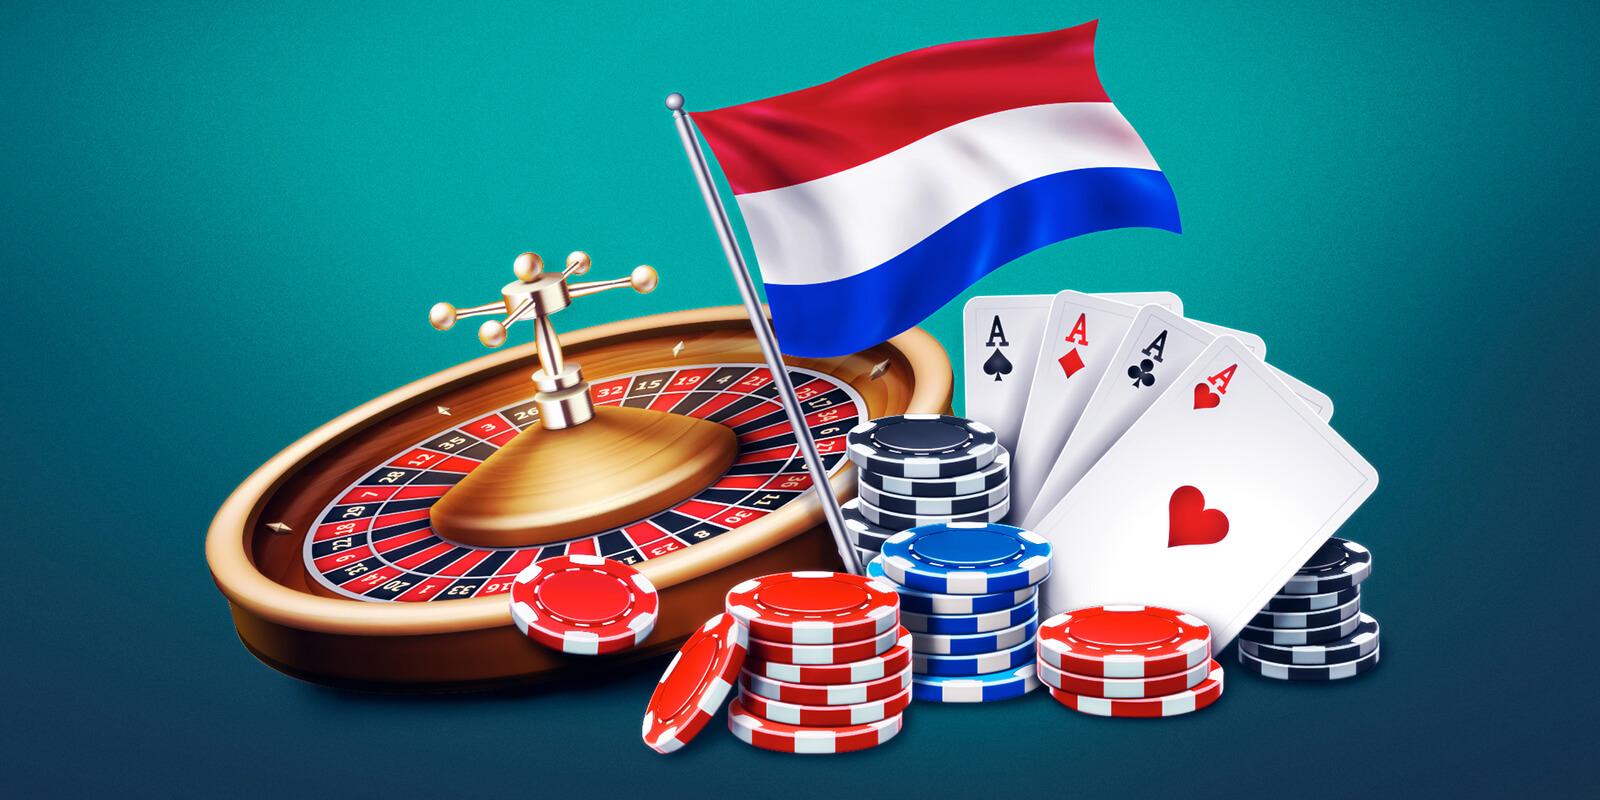 Poker Poker Table Gambling Casino Card game